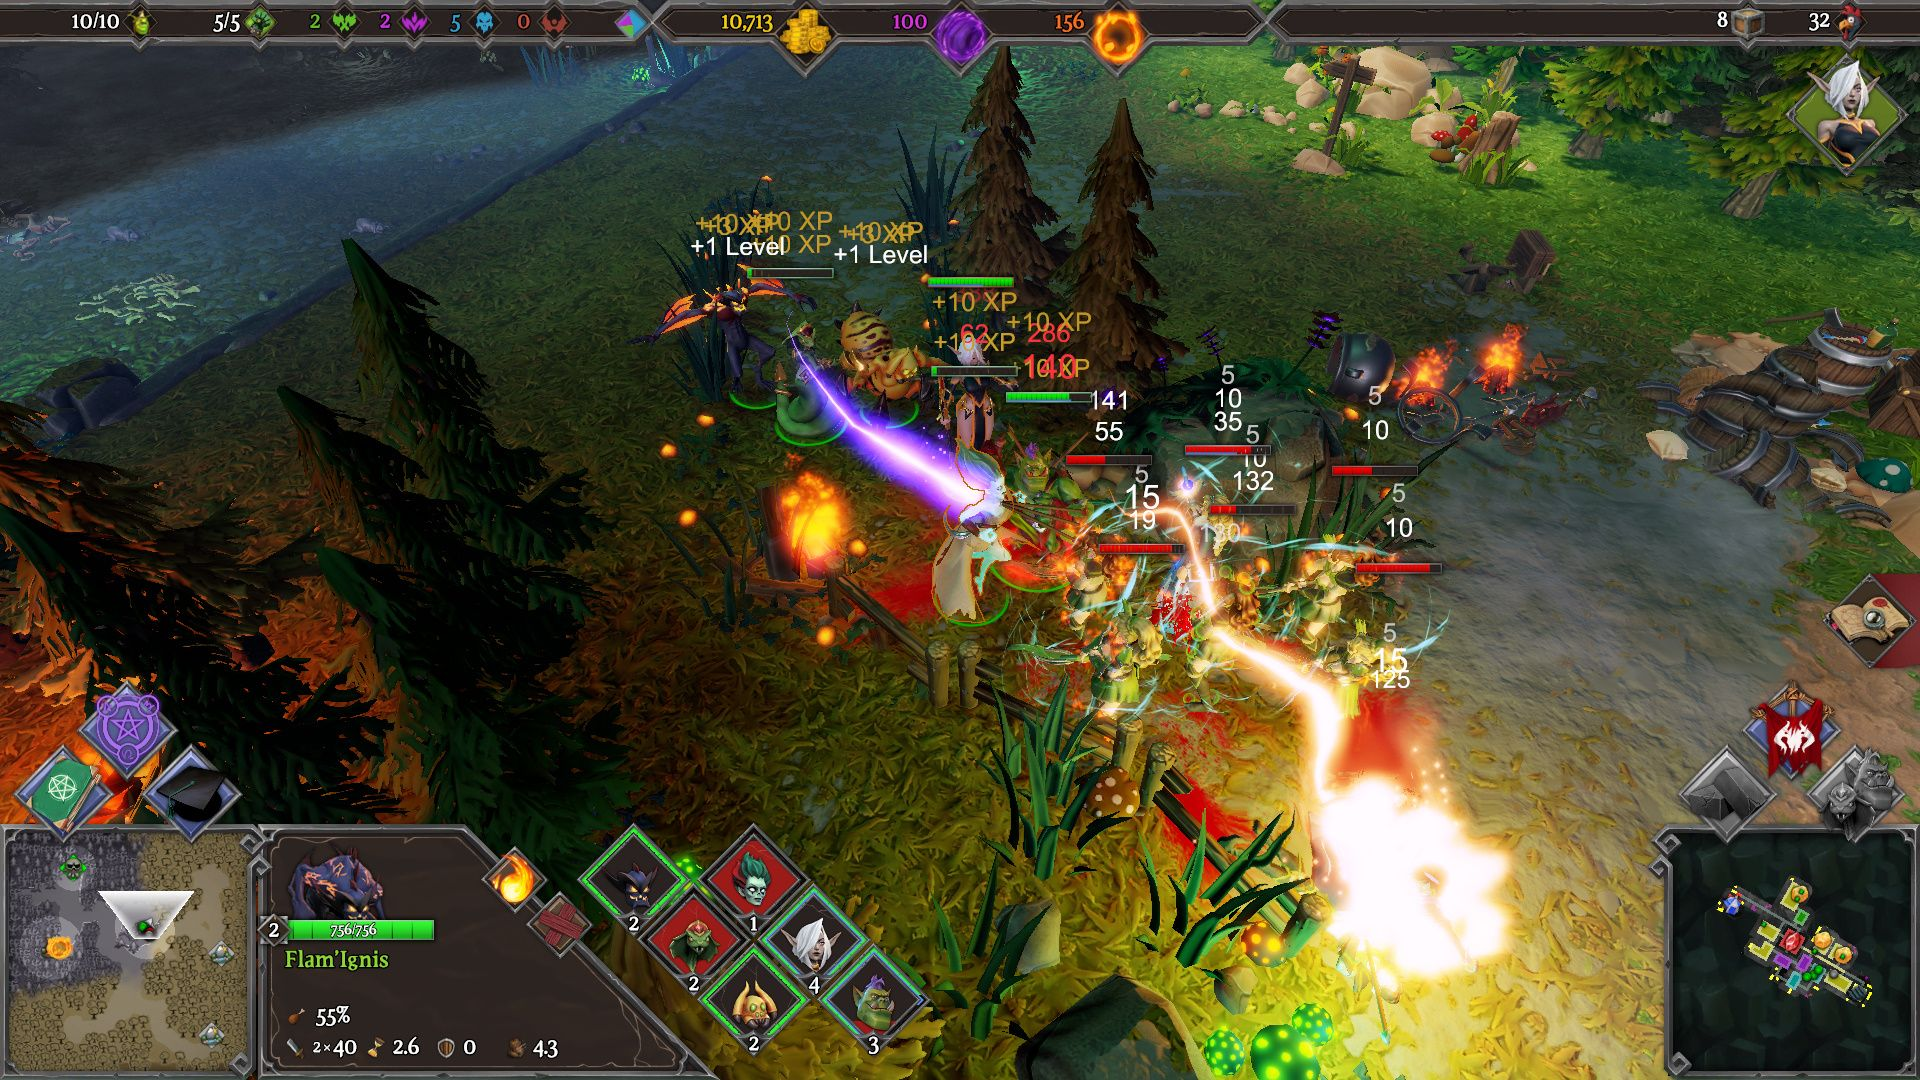 Dungeon 3 Screenshot 2